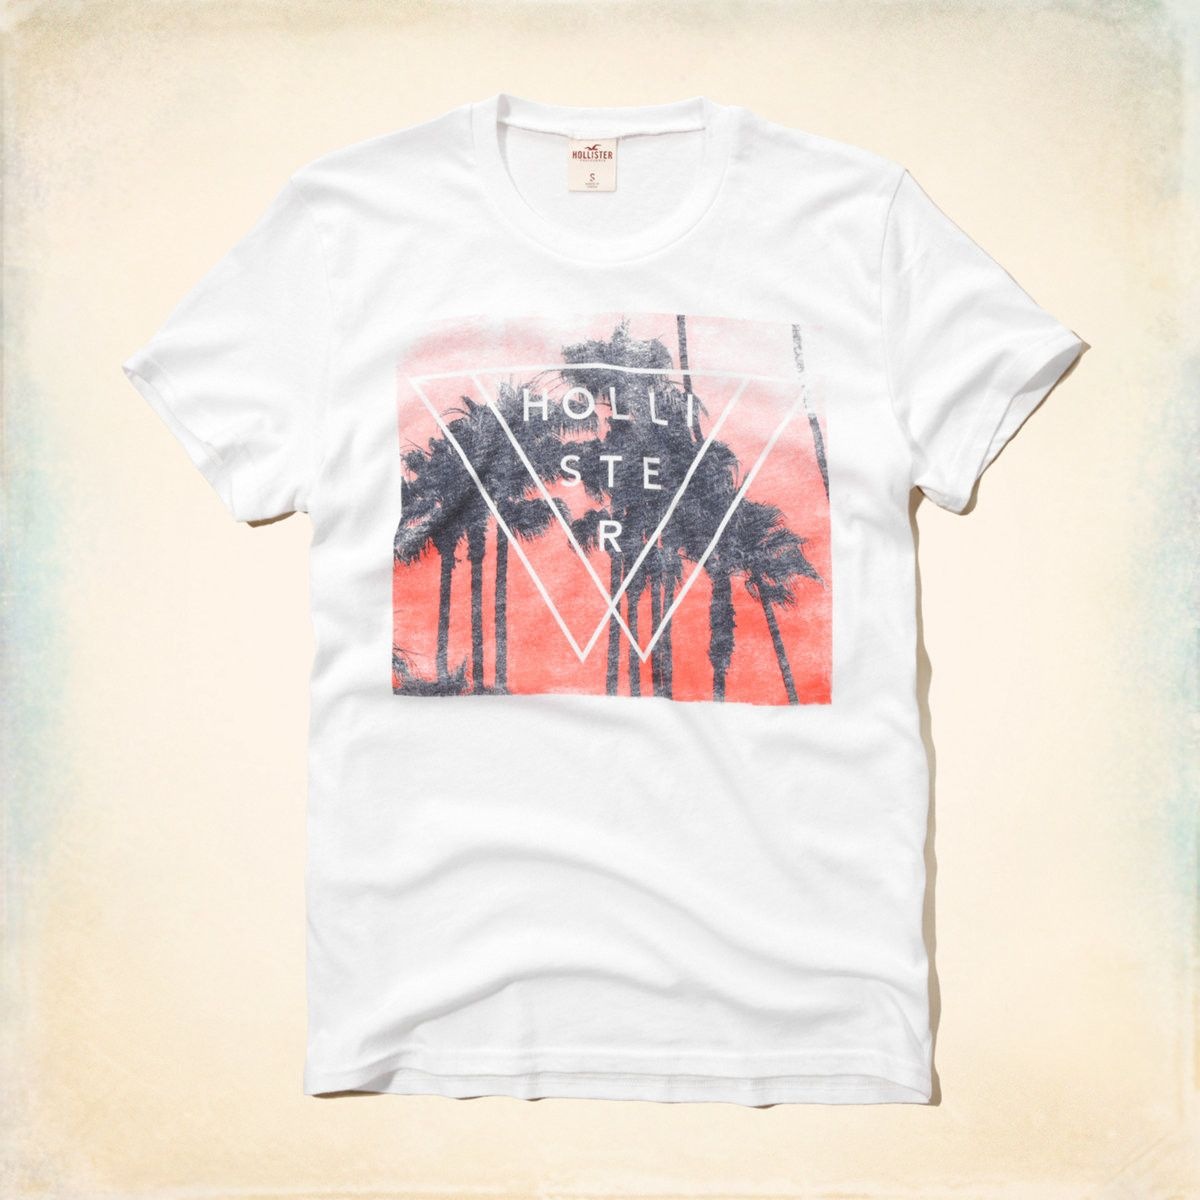 hollister mens vintage logo graphic tshirt white